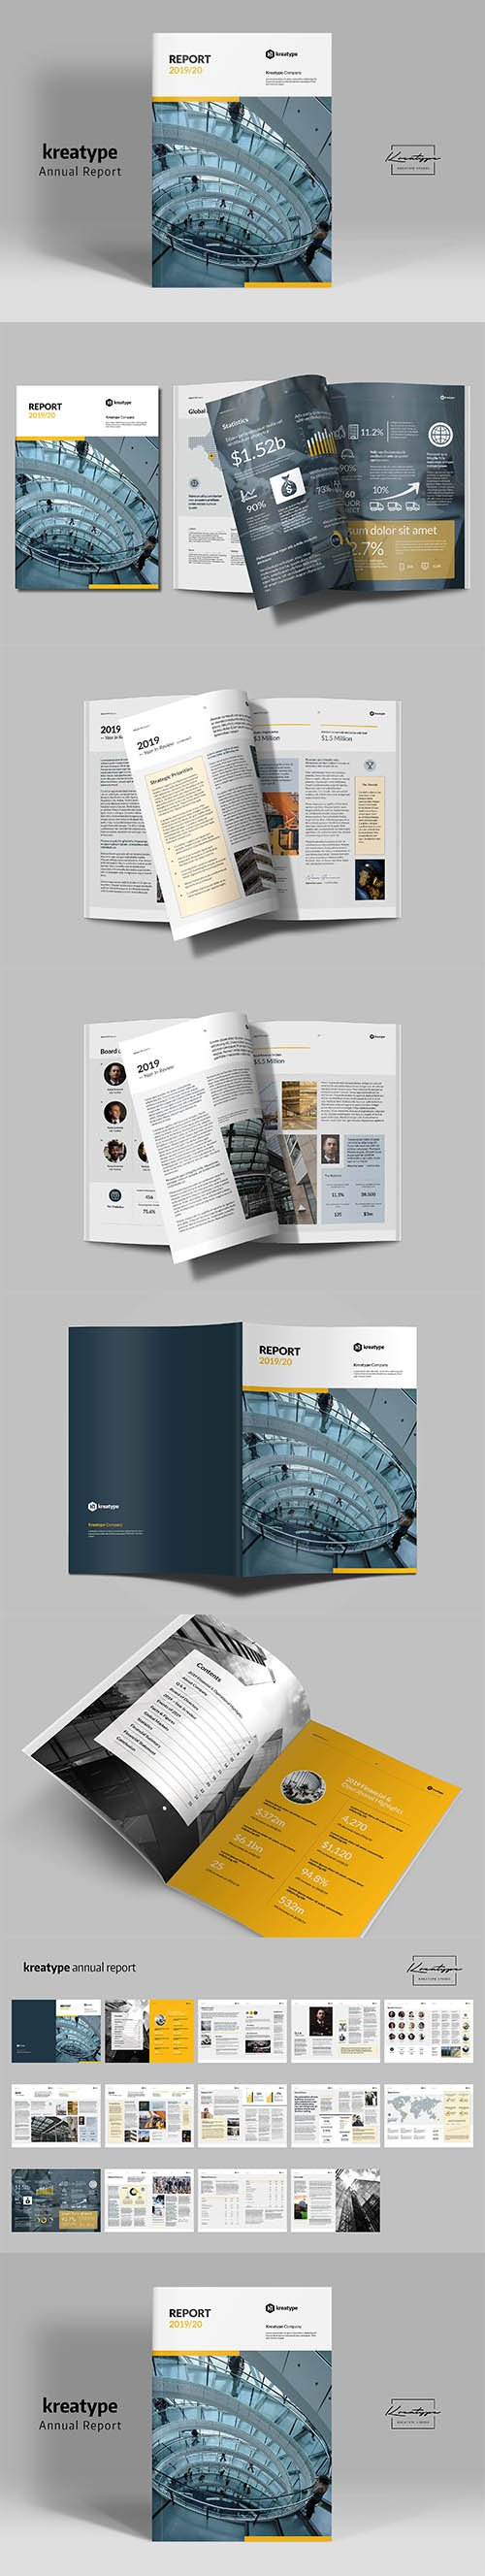 CreativeMarket - Kreatype Annual Report 3376802